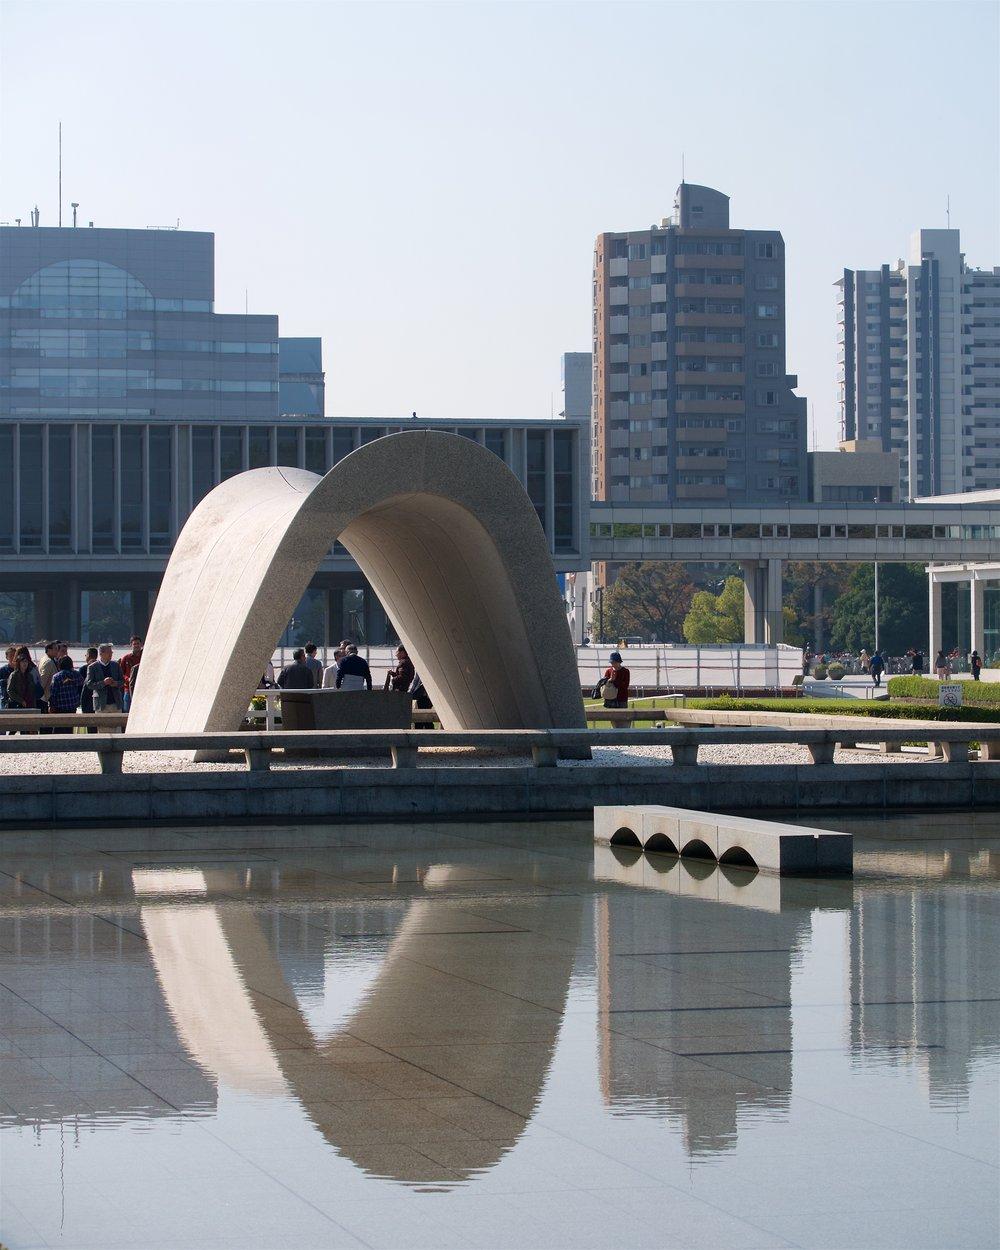 Pond, cenotaph